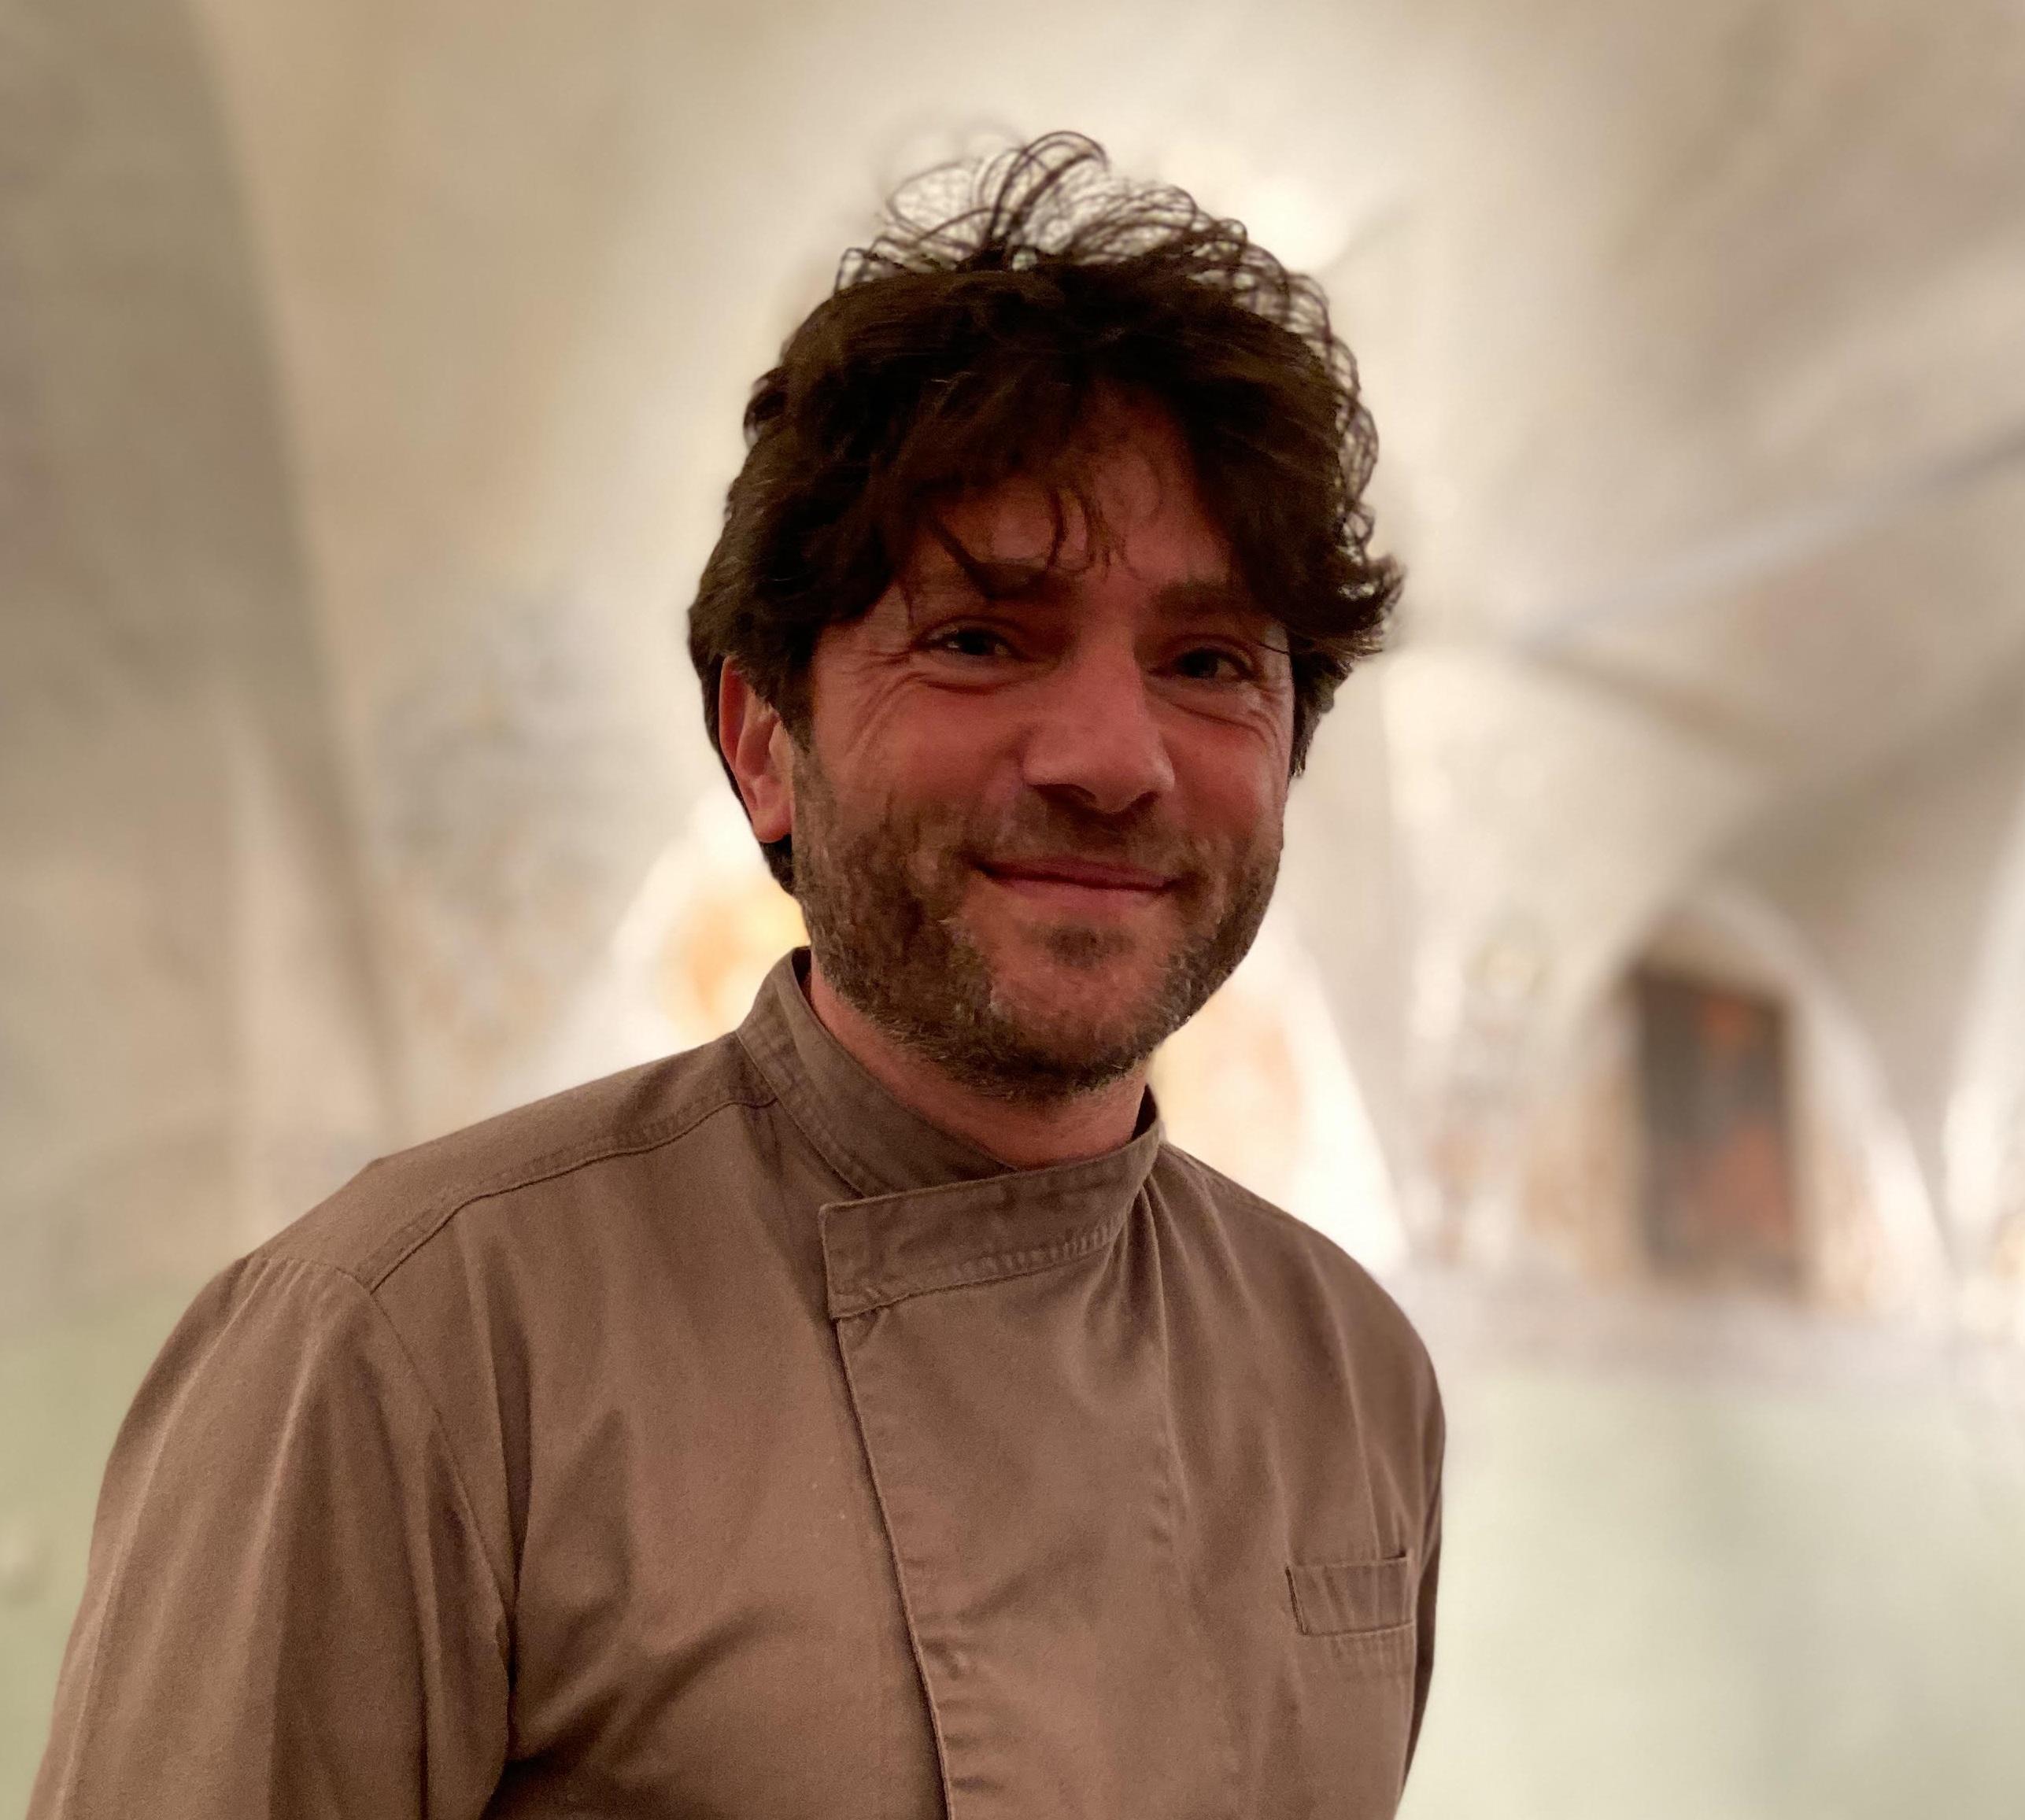 Incontro con lo chef Francesco Mastronardi